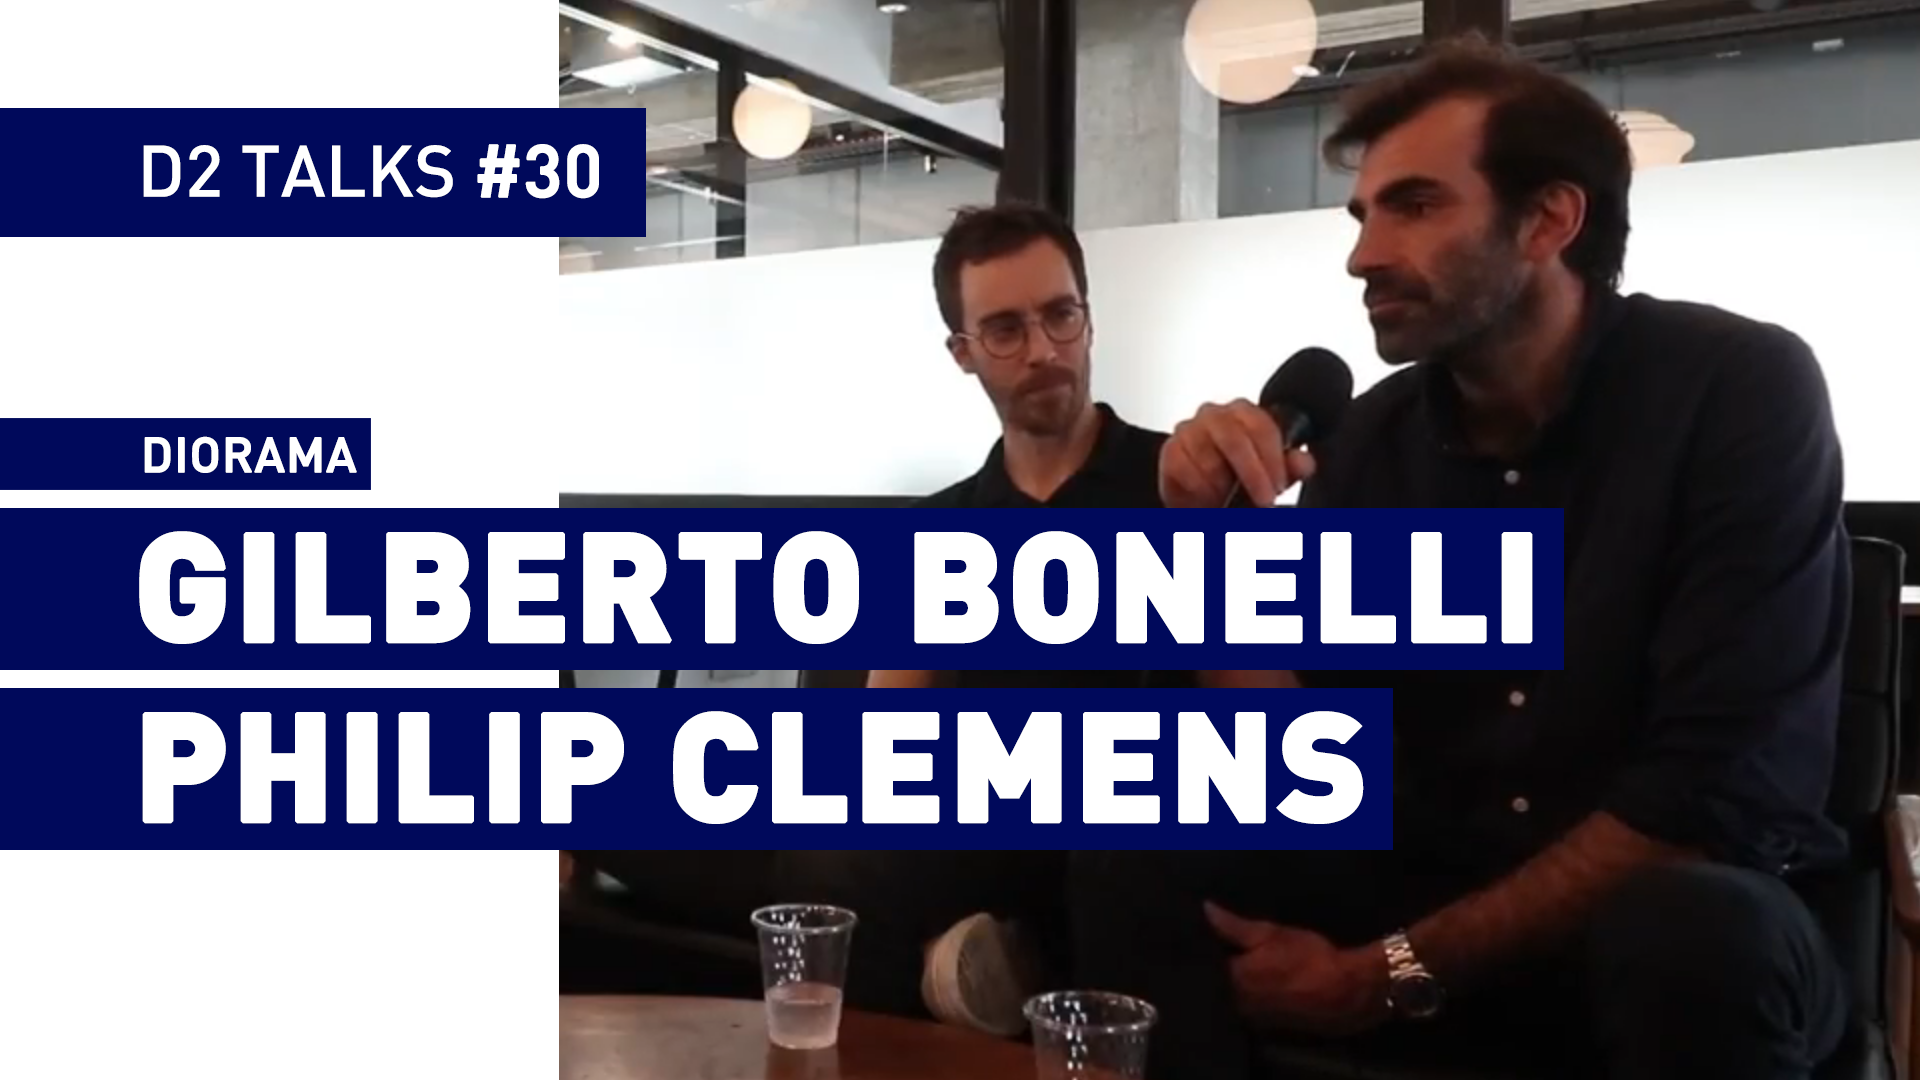 D2 Talks #30: Gilberto Bonelli and Philip Clemens of Diorama